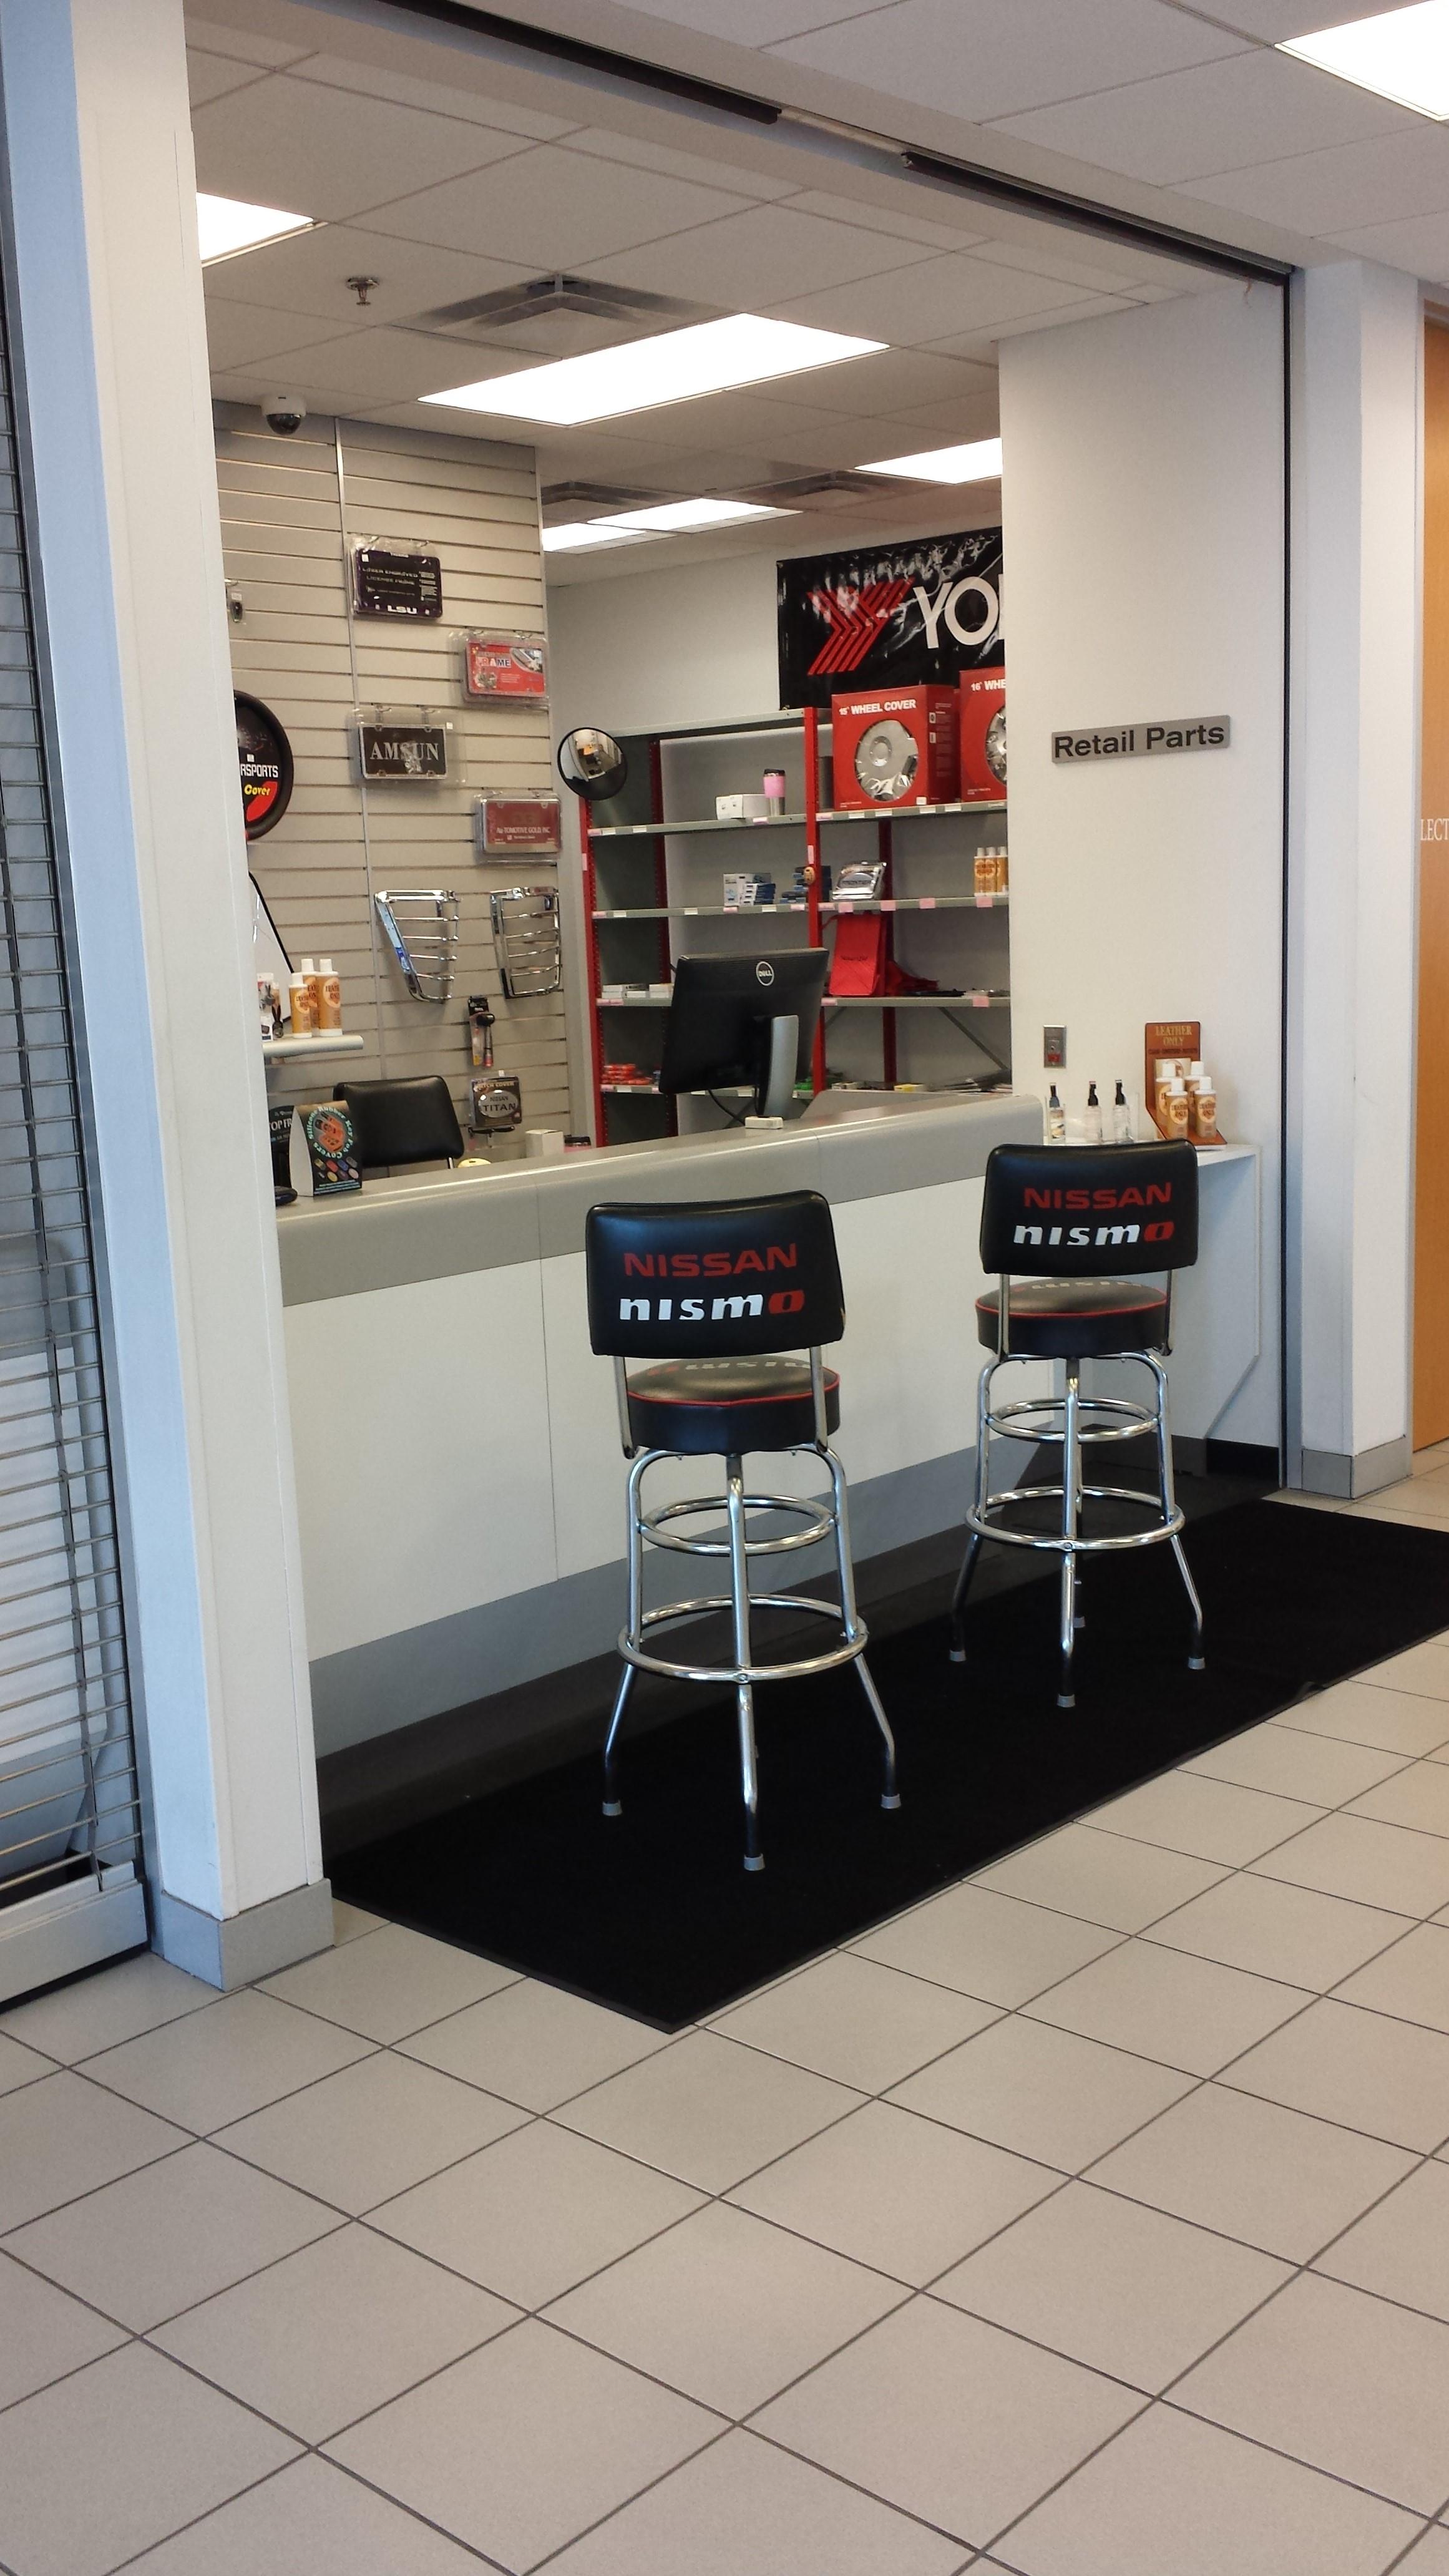 Nissan Dealership Katy Tx >> Gillman Nissan Fort Bend in Rosenberg, TX 77471 - ChamberofCommerce.com